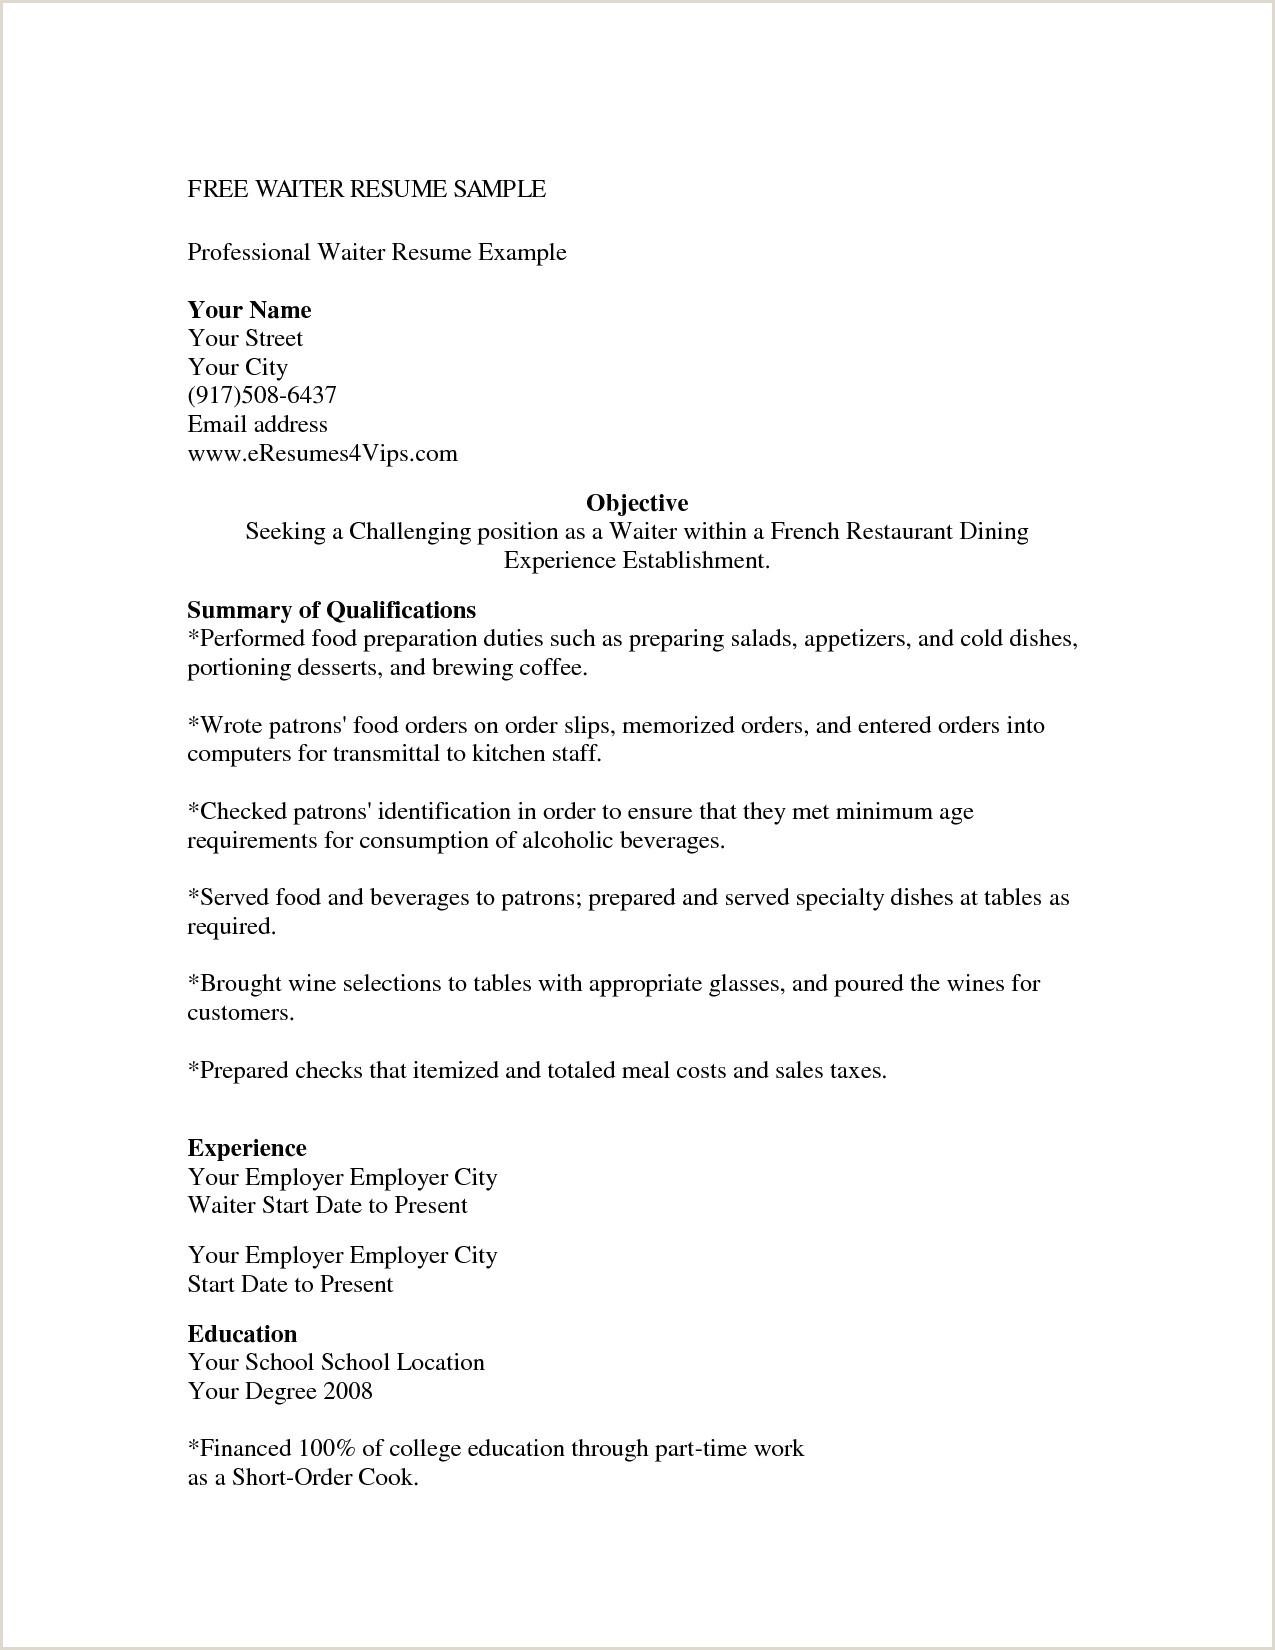 Cv Format For Hotel Job Waiter Waiter Job Description Resume Templates Catering Back Duties